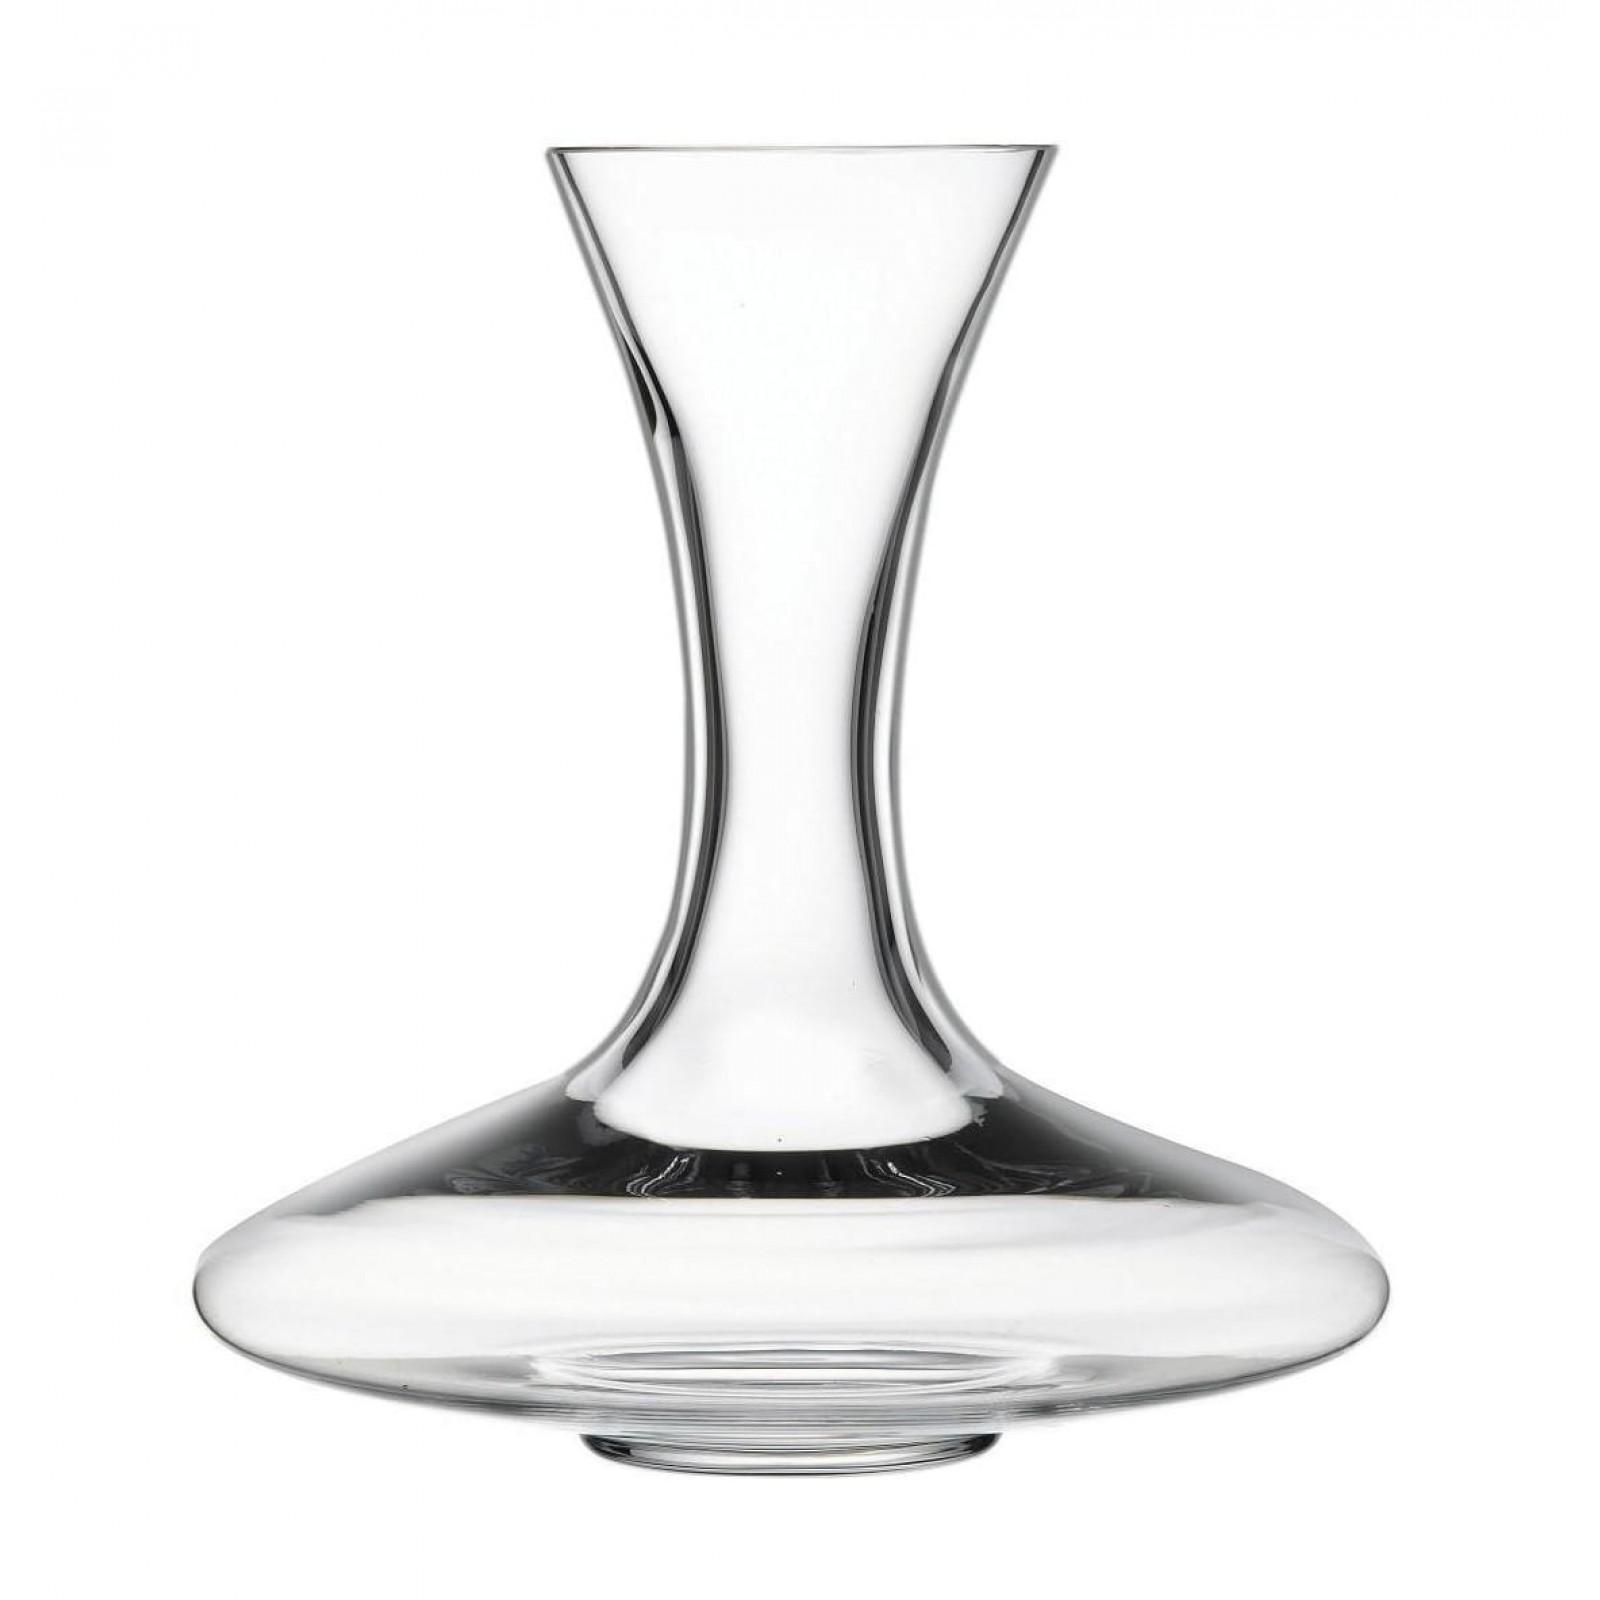 Vini Carafe 750 ml - Nude Glass